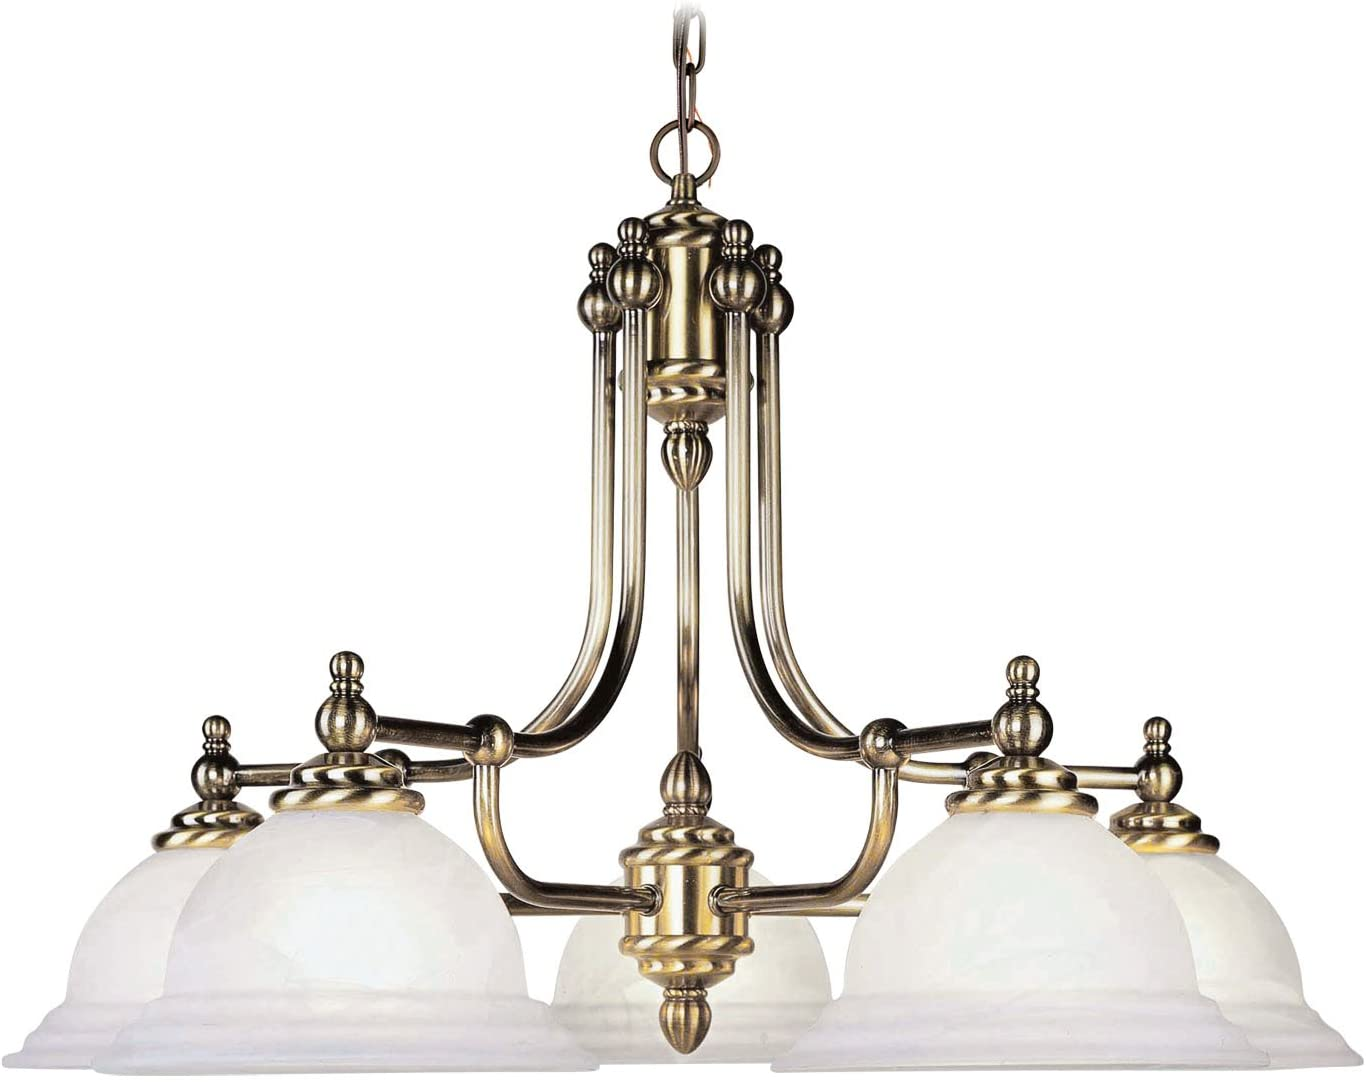 Livex Lighting 4255-01 North Port 5 Light Antique Brass Chandelier Review